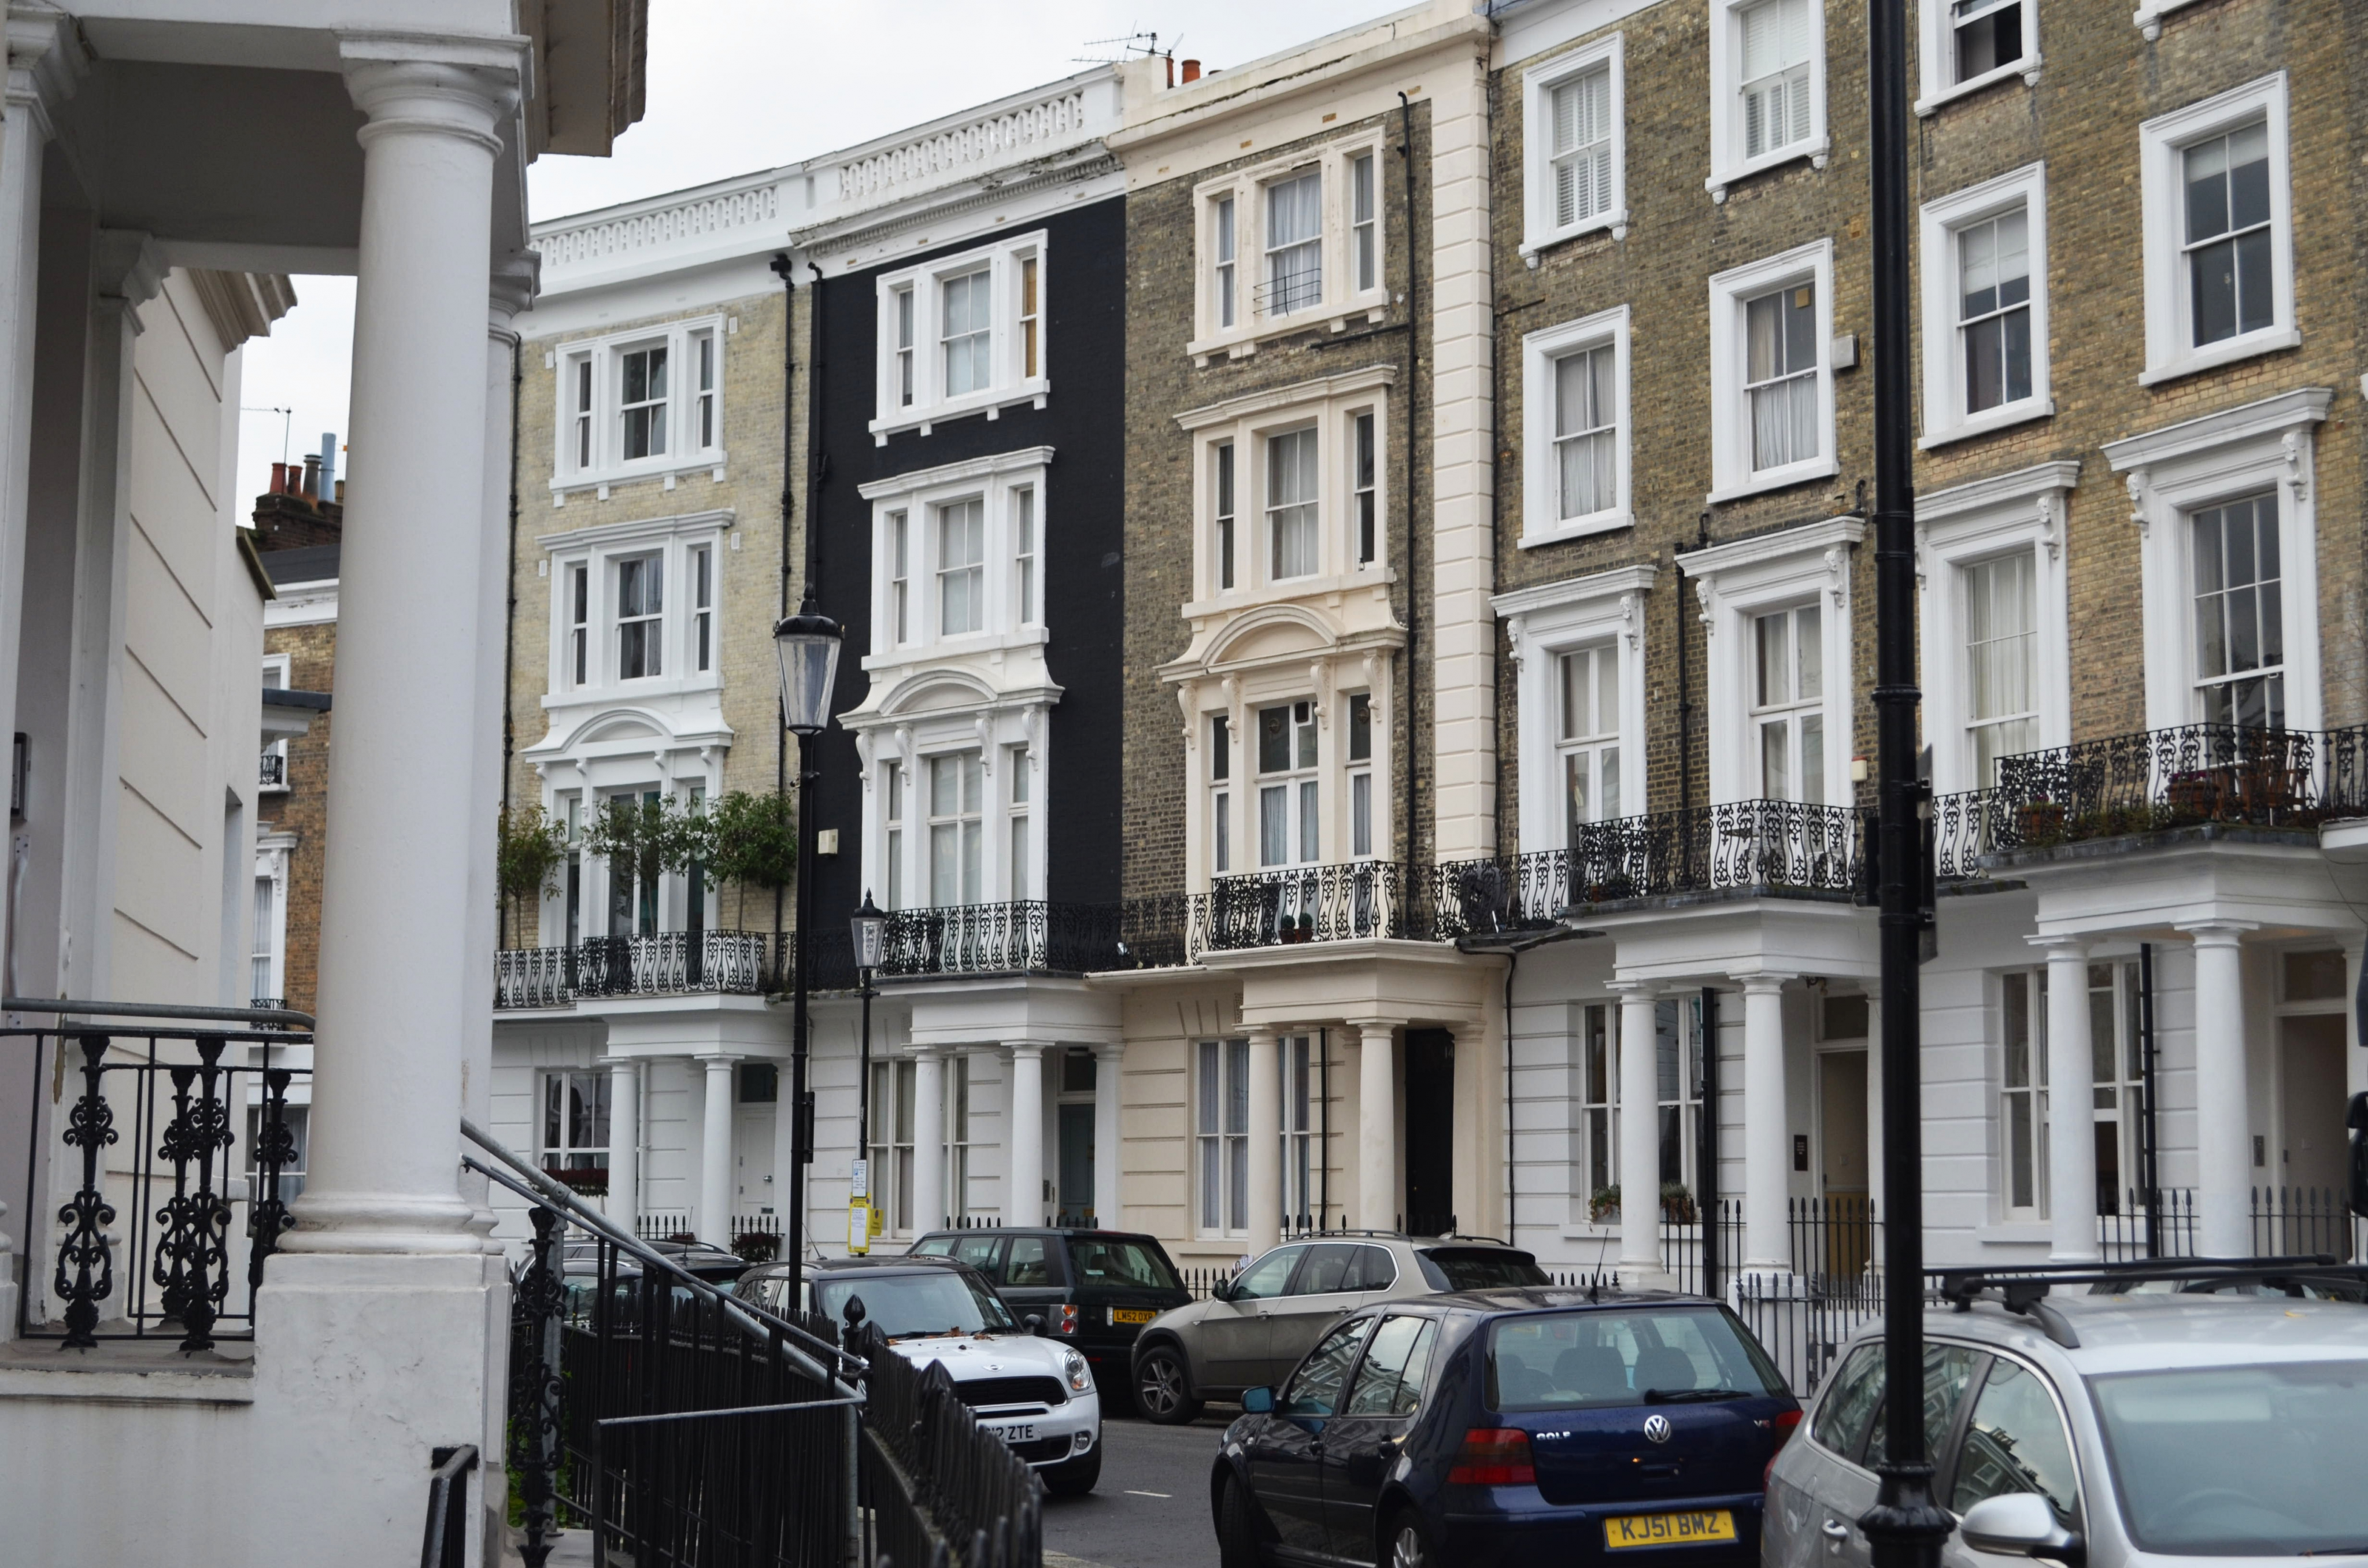 Notting Hill!